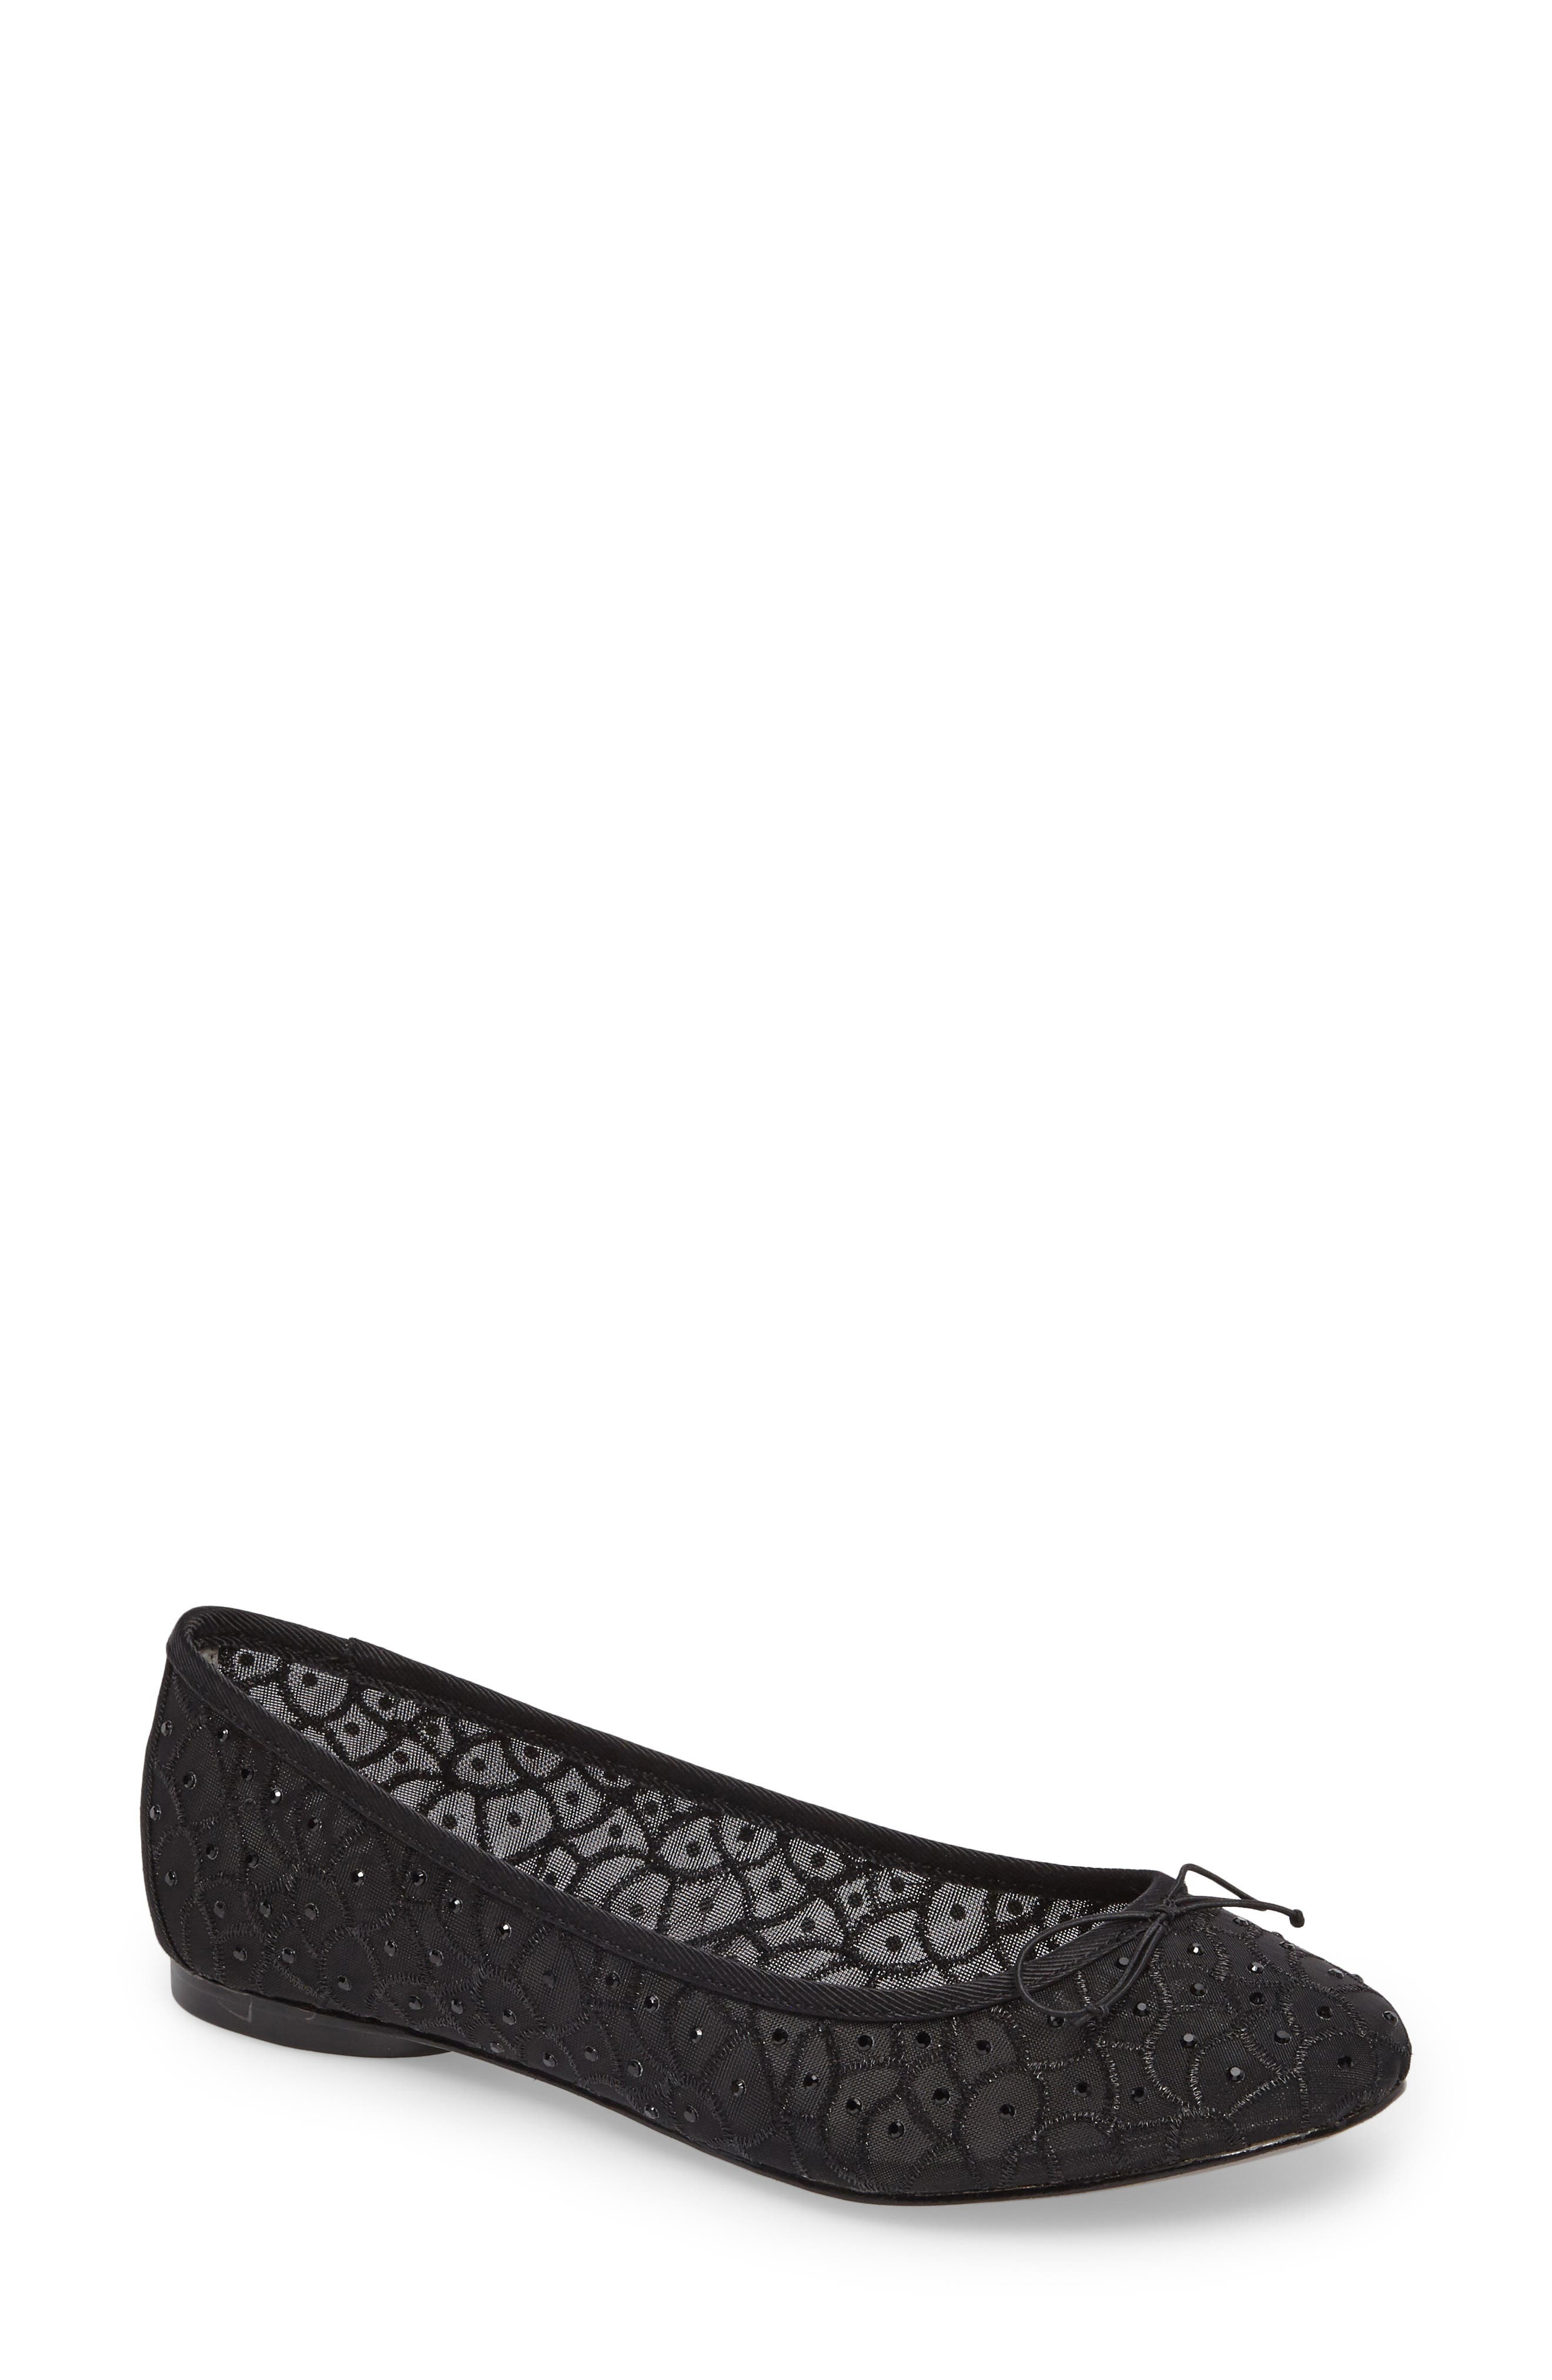 Natalia Ballet Flat,                         Main,                         color, Black Fabric